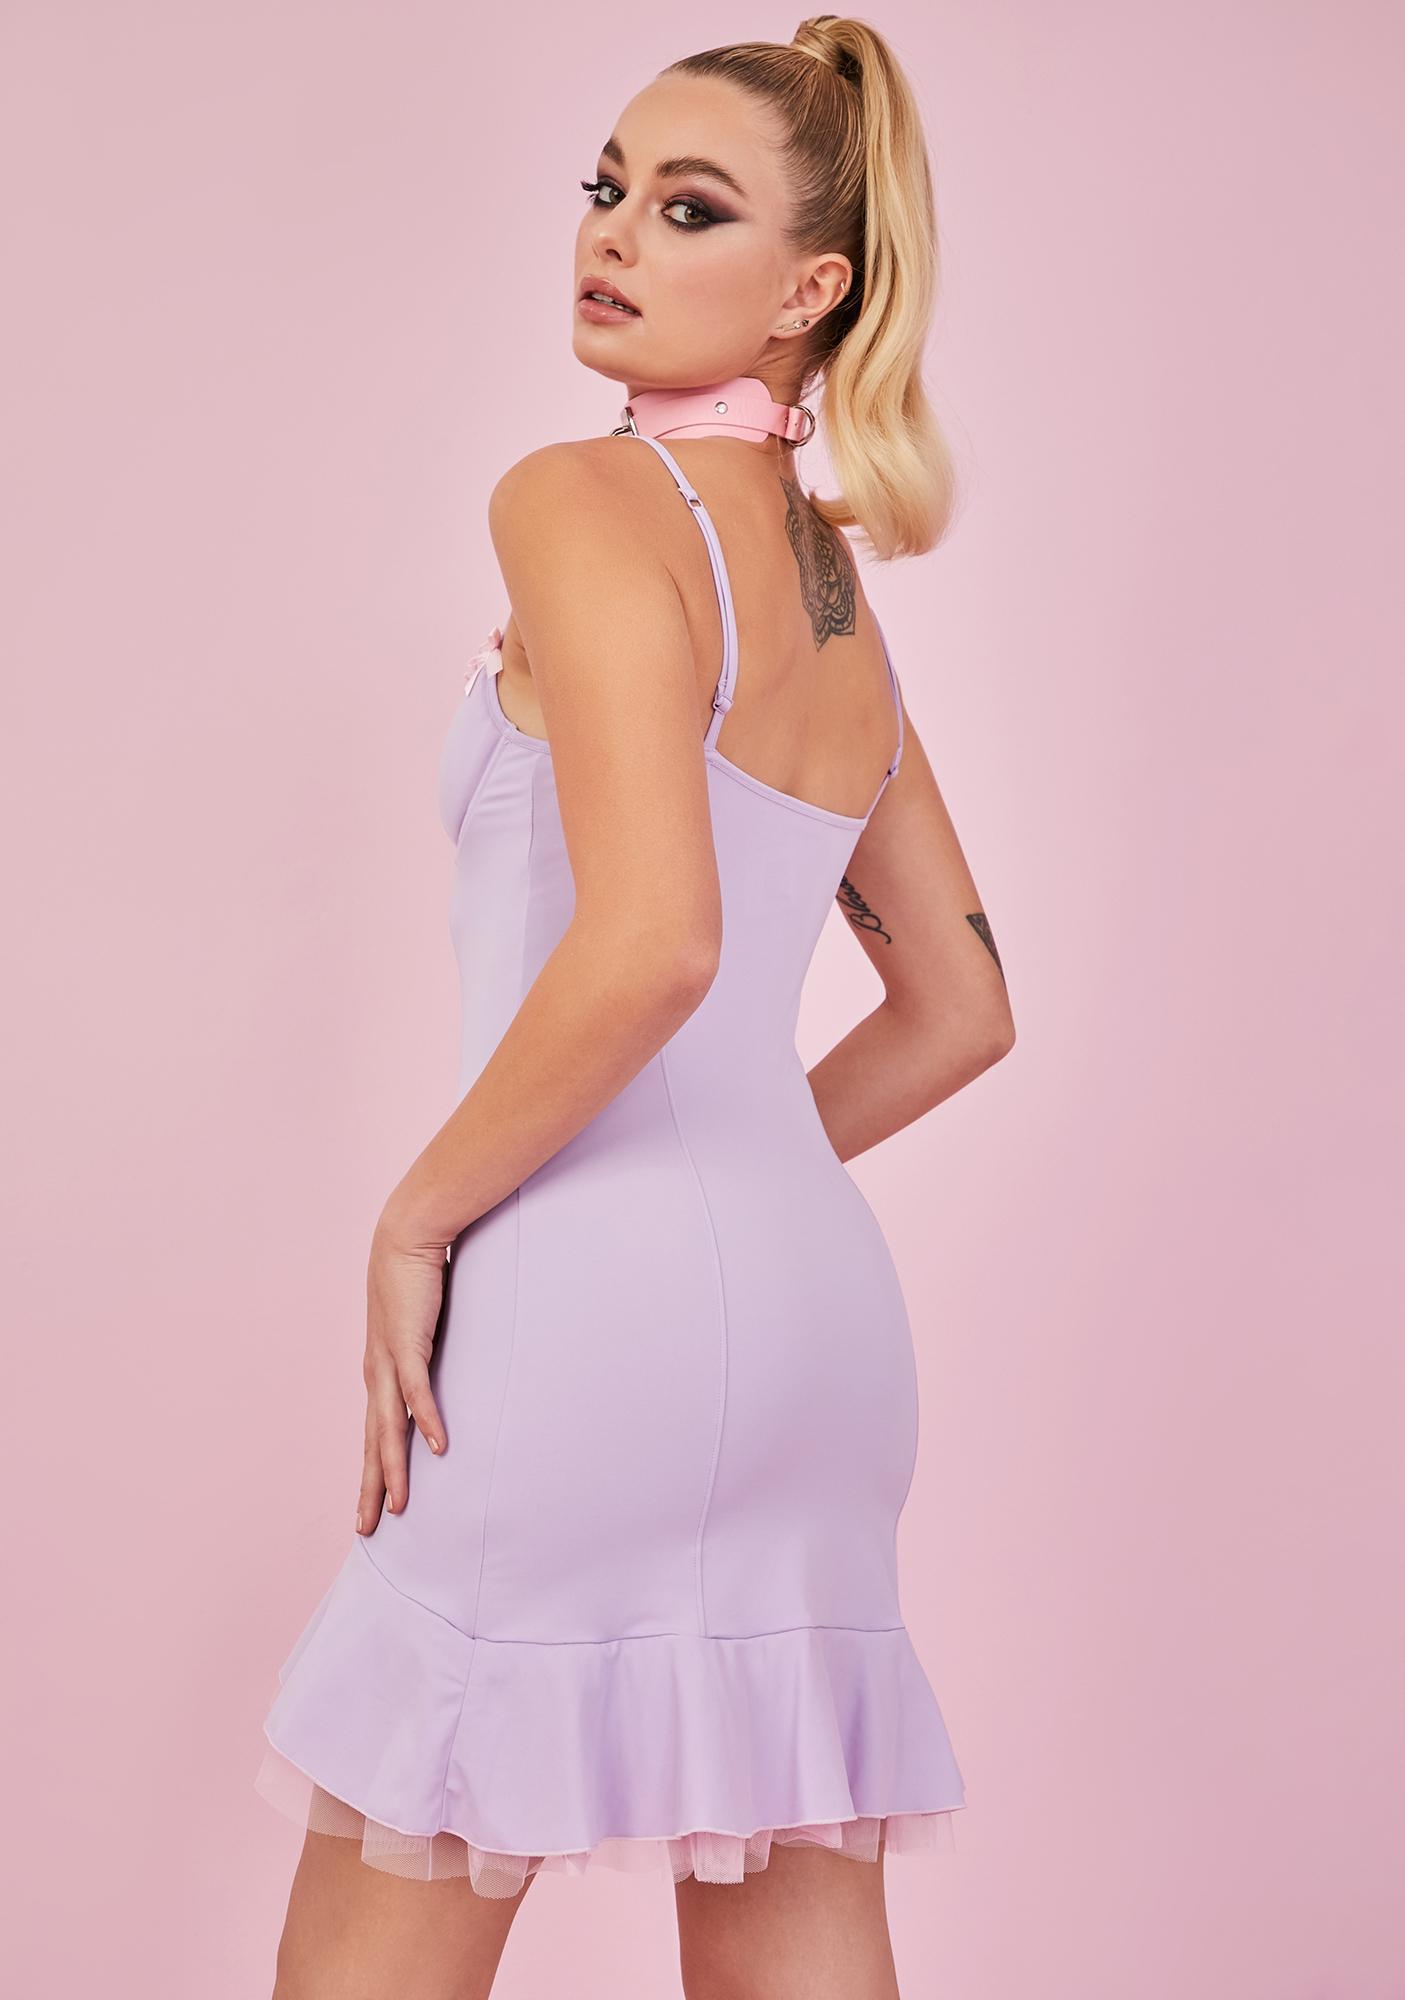 Sugar Thrillz Hold Me Closer Bustier Slip Dress